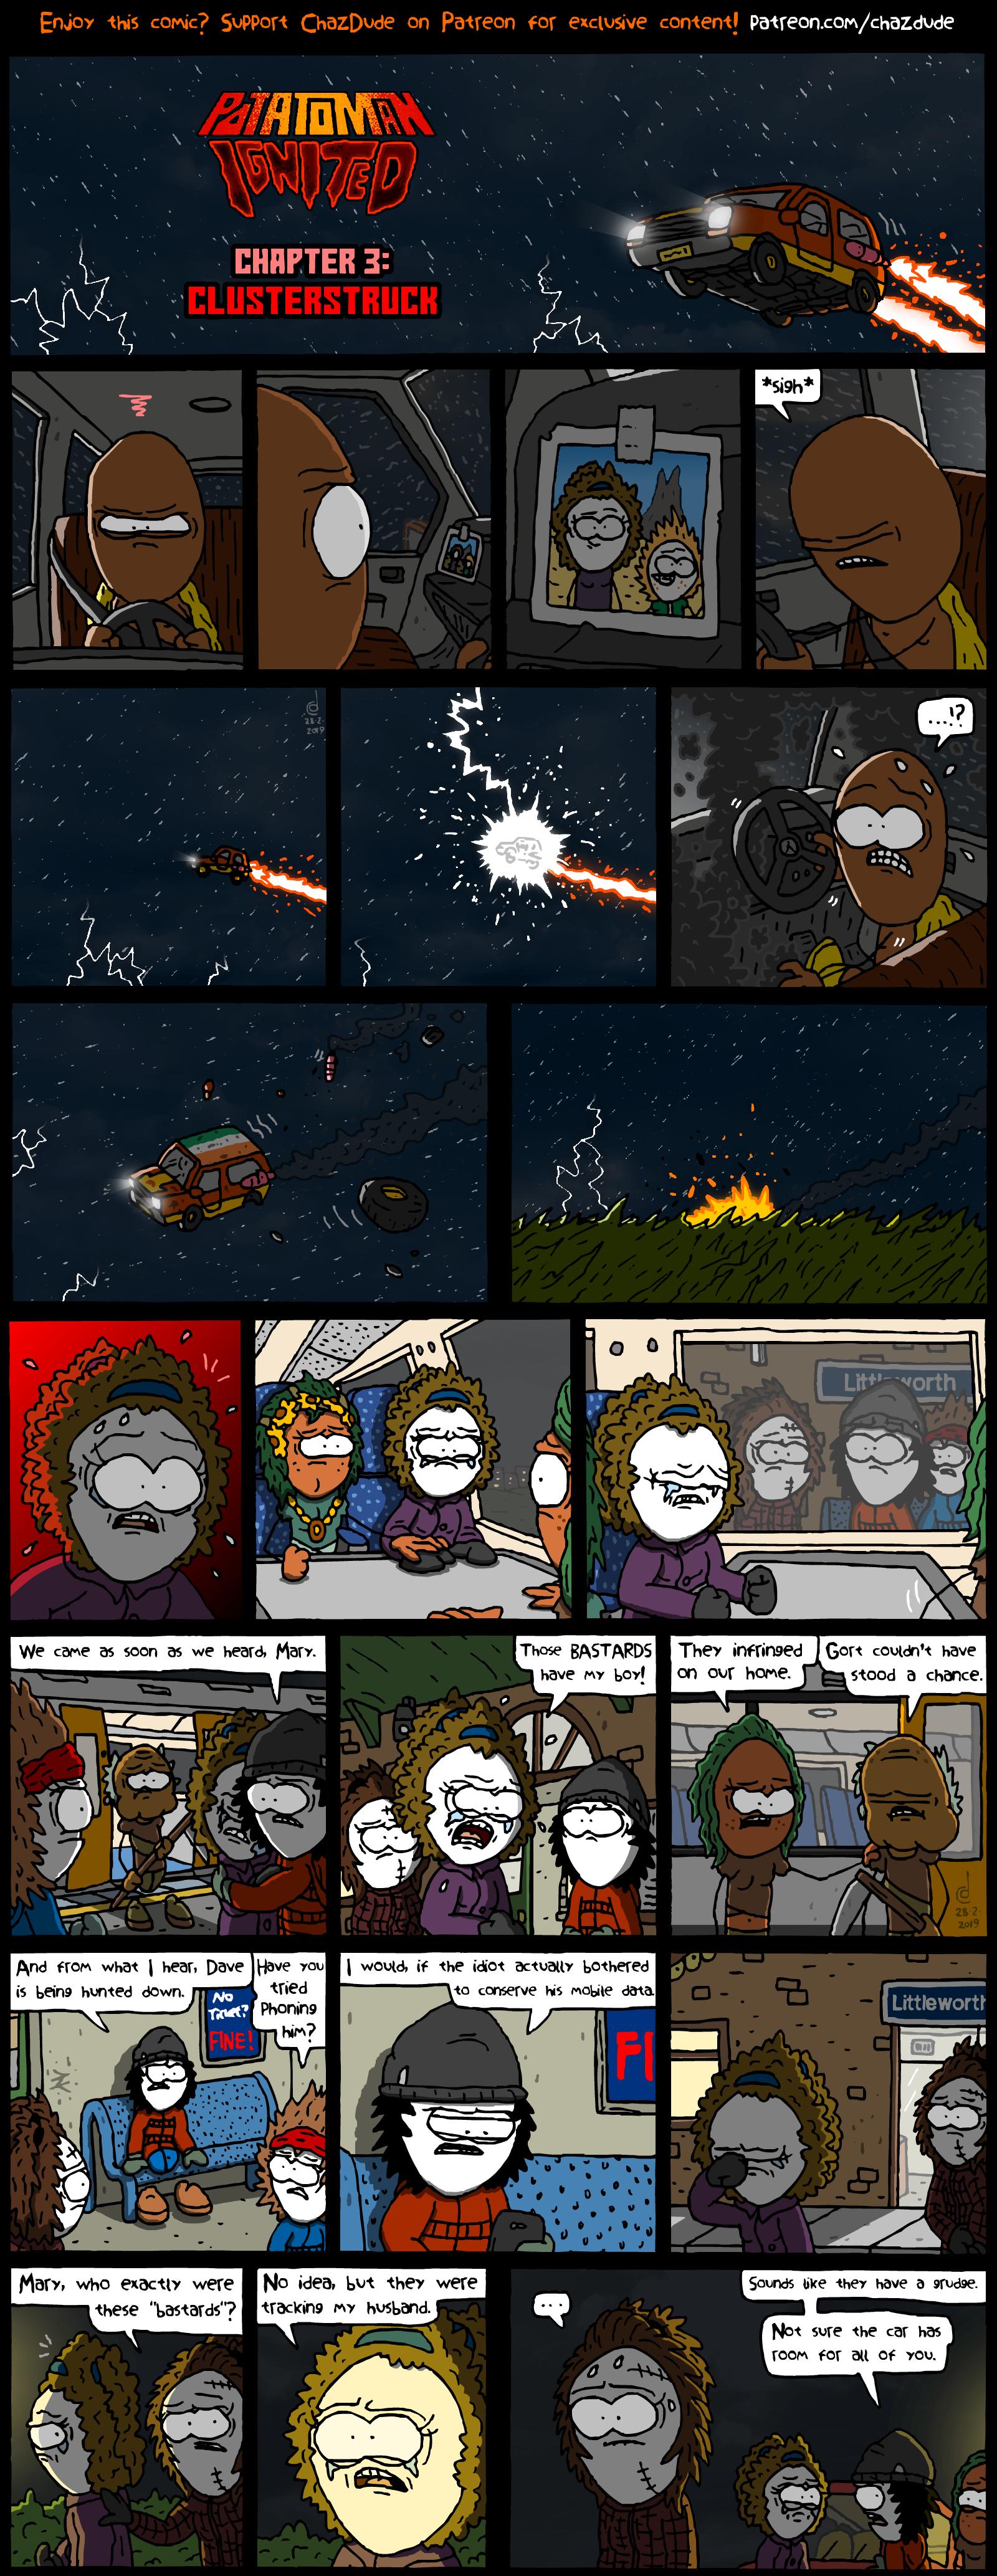 Potatoman Ignited Chapter 3: Clusterstruck